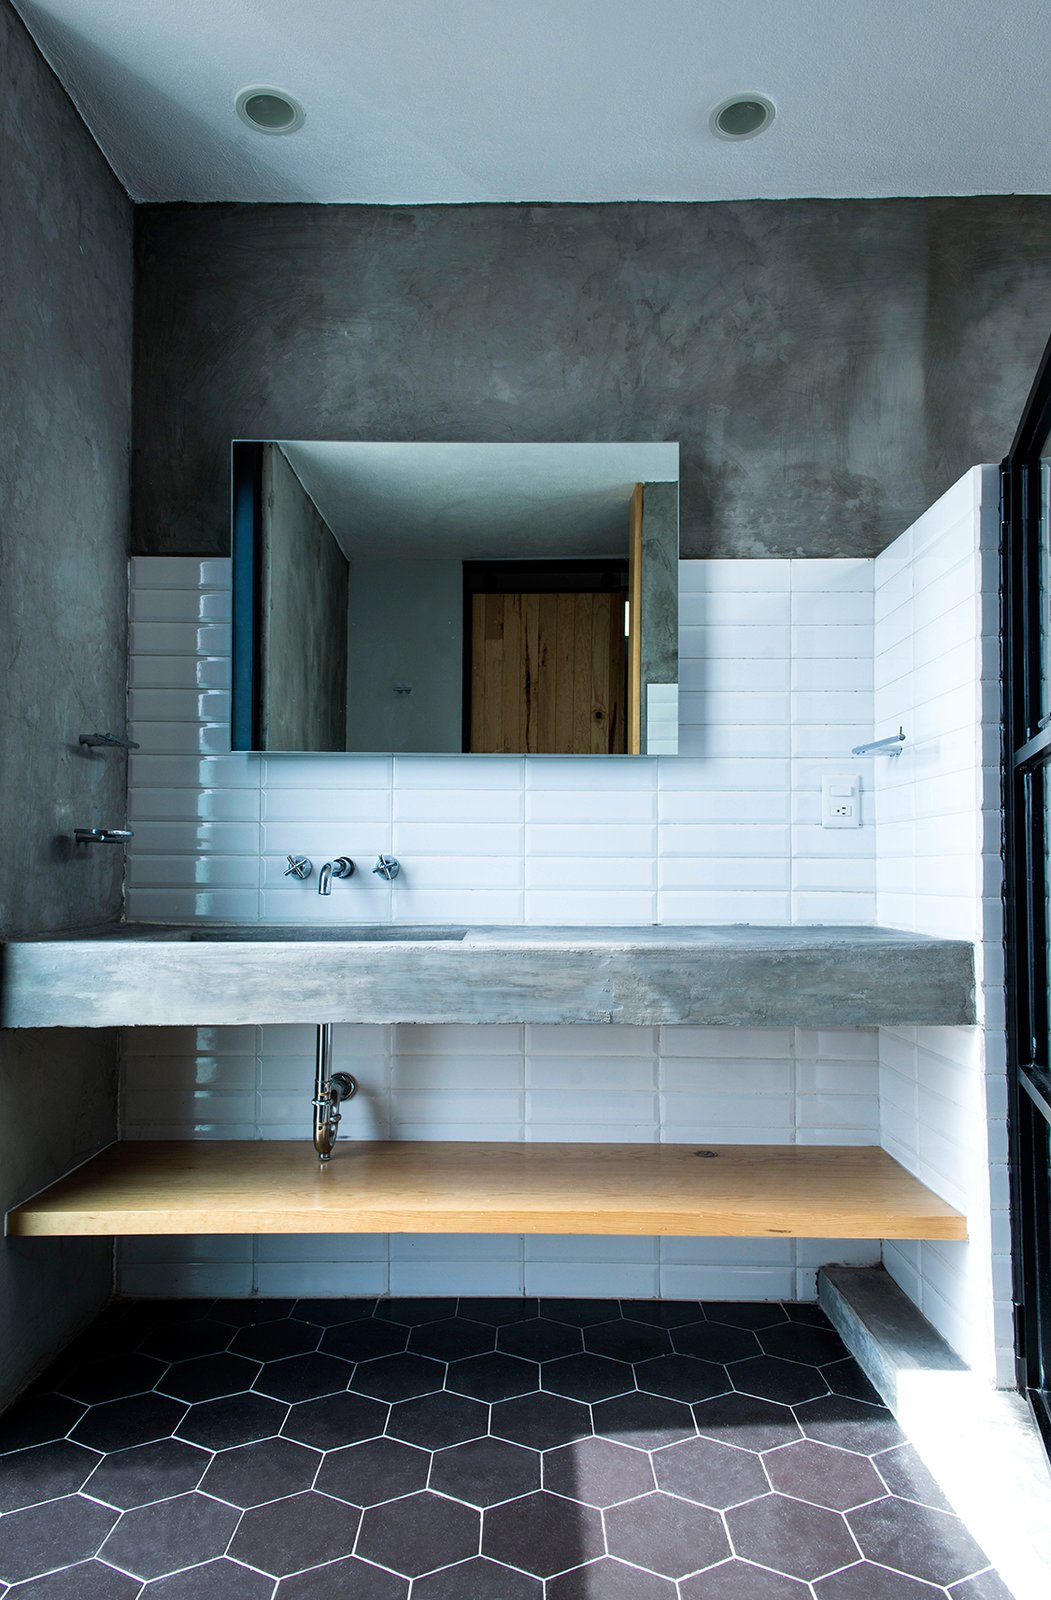 Bath Room, Concrete Counter, Undermount Sink, Ceramic Tile Floor, and Subway Tile Wall Main Bathroom  Casa MA by e|arquitectos